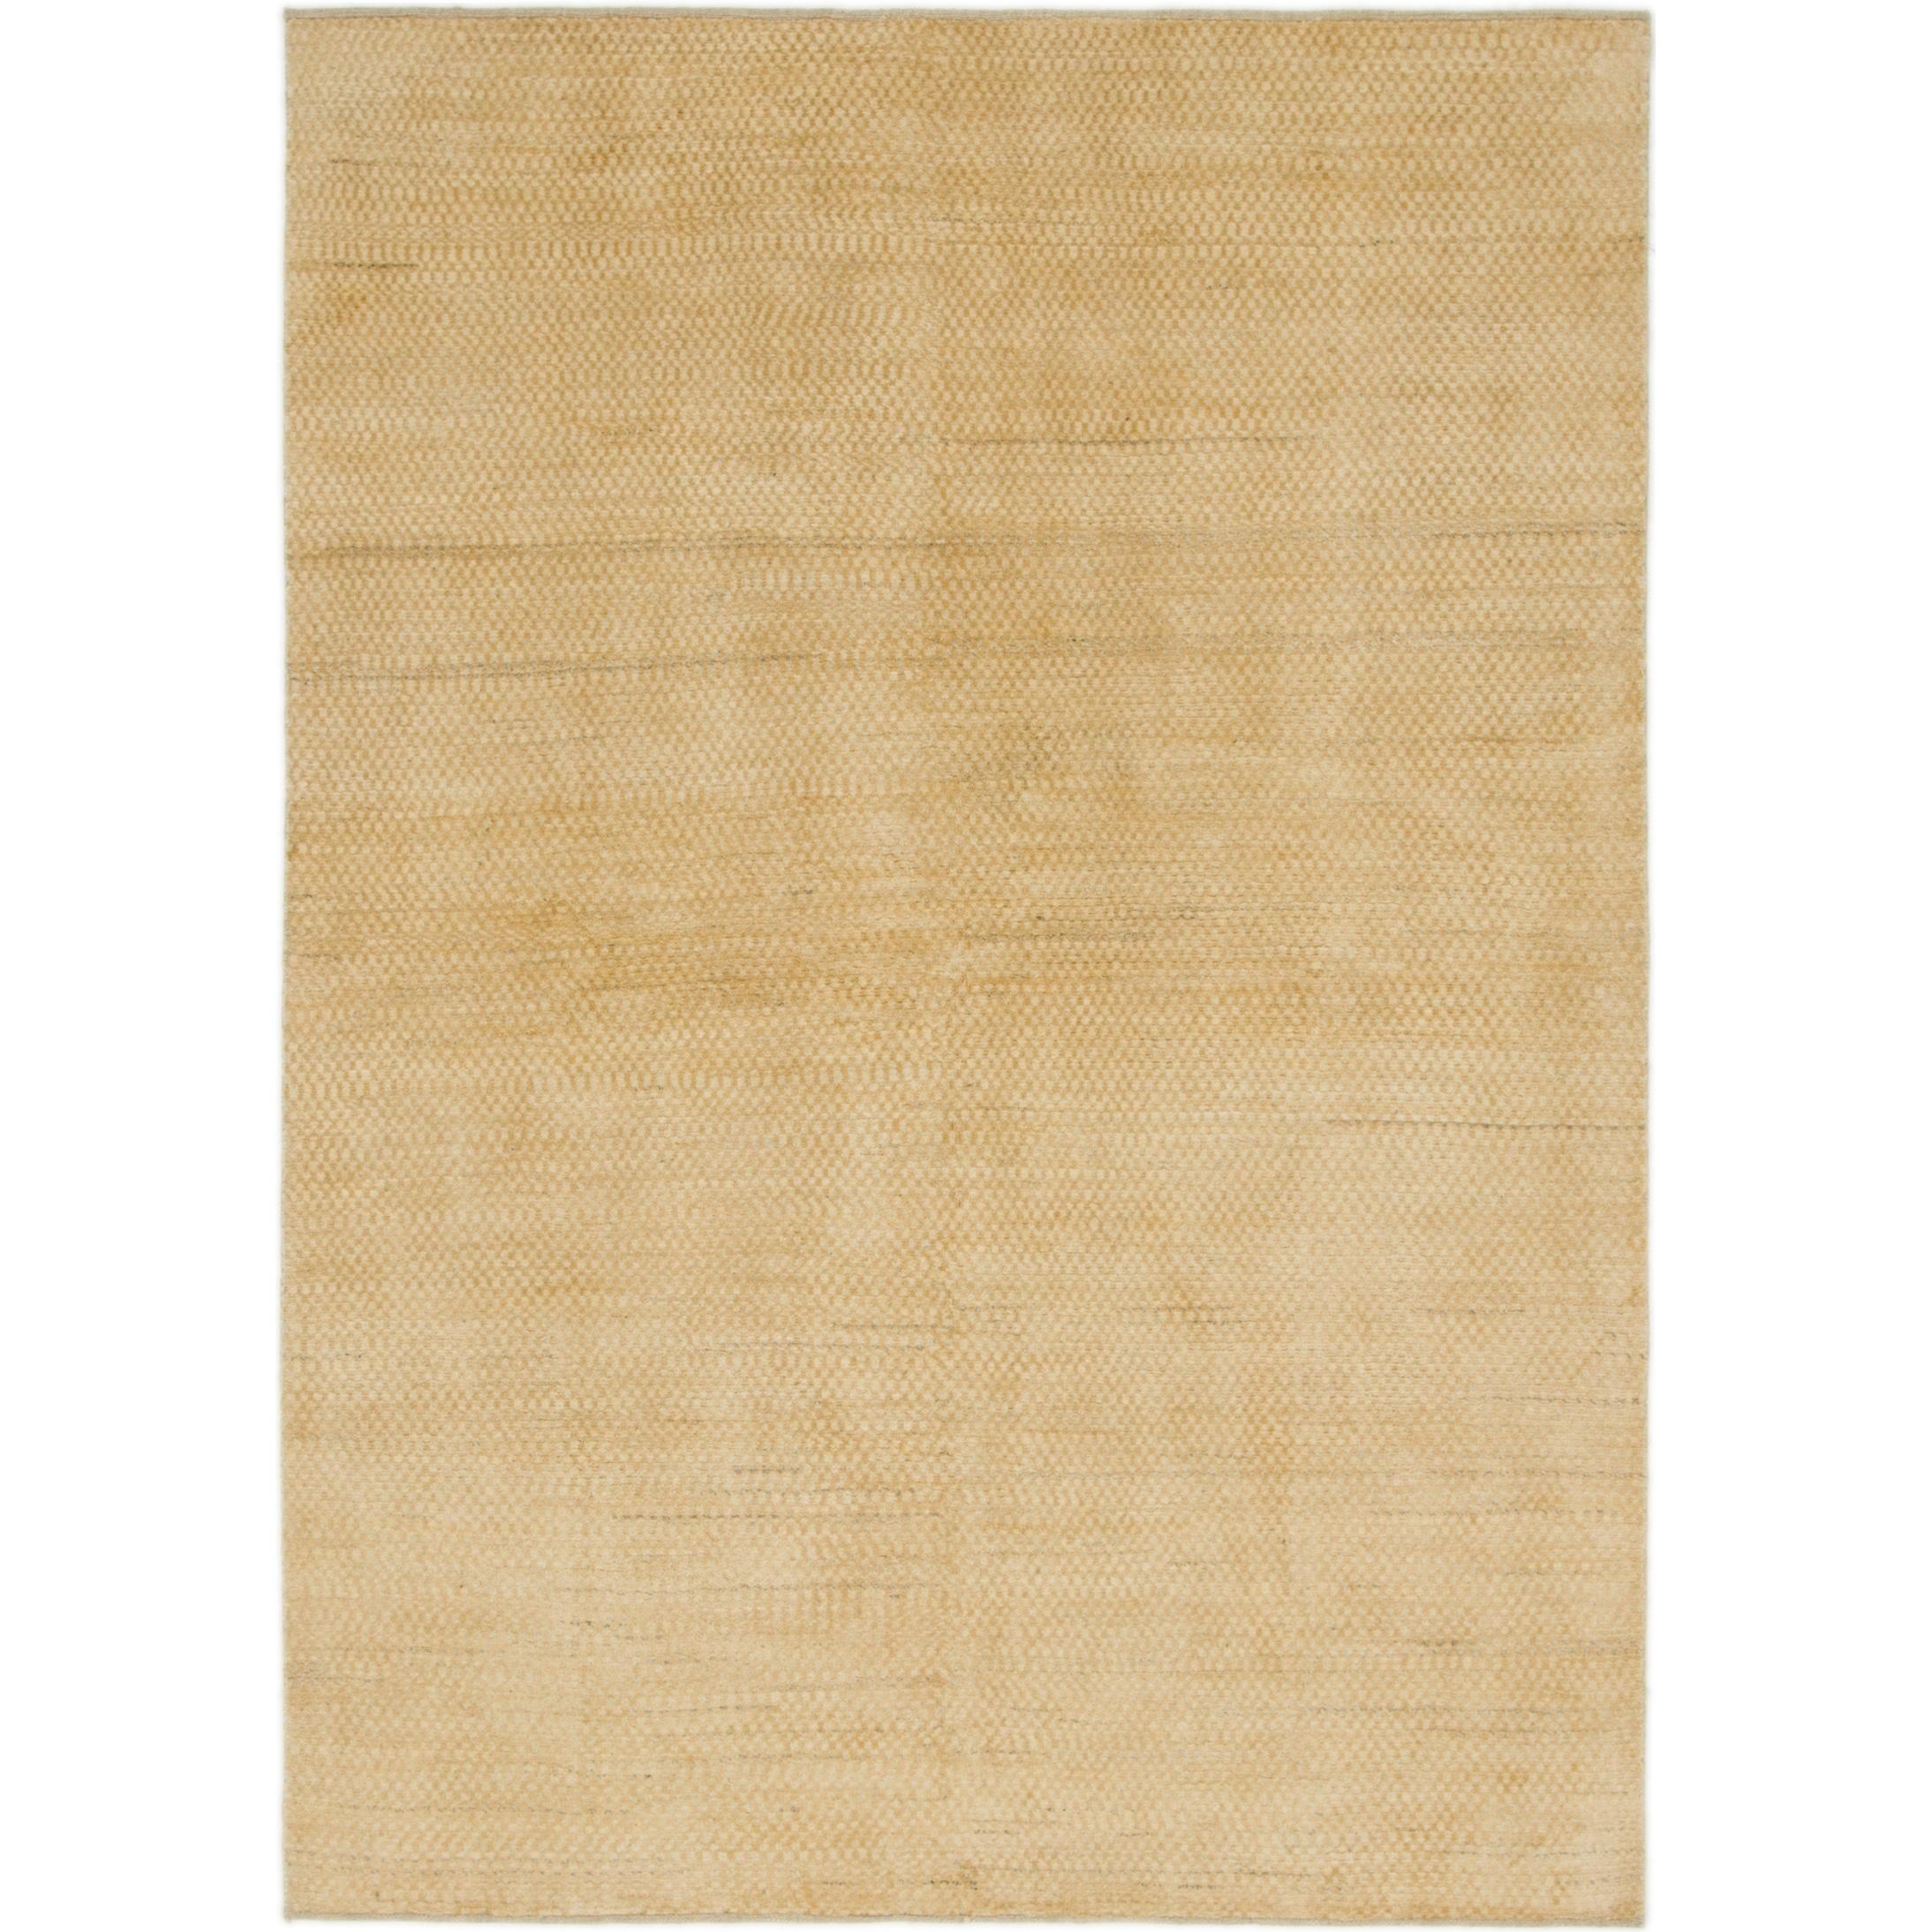 Hand Knotted Kashkuli Gabbeh Wool Area Rug - 5 7 x 7 10 (Cream - 5 7 x 7 10)